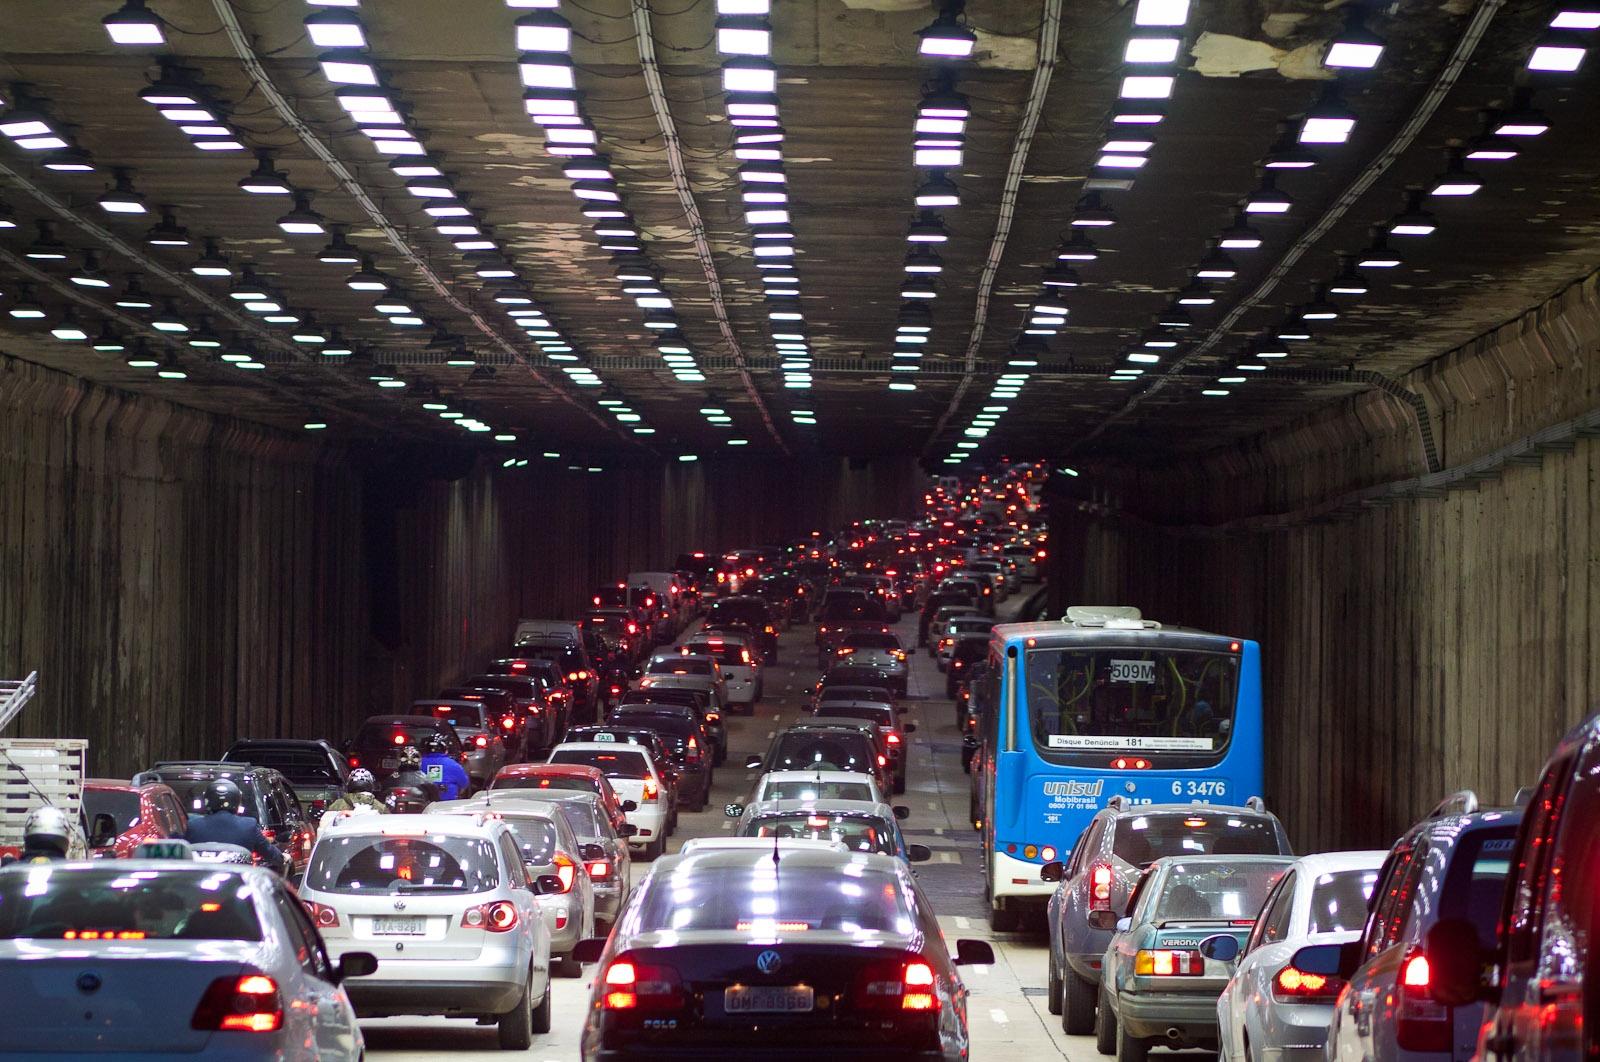 Trânsito pesado na entrada do tunel / Heavy traffic at the tunnel entrance